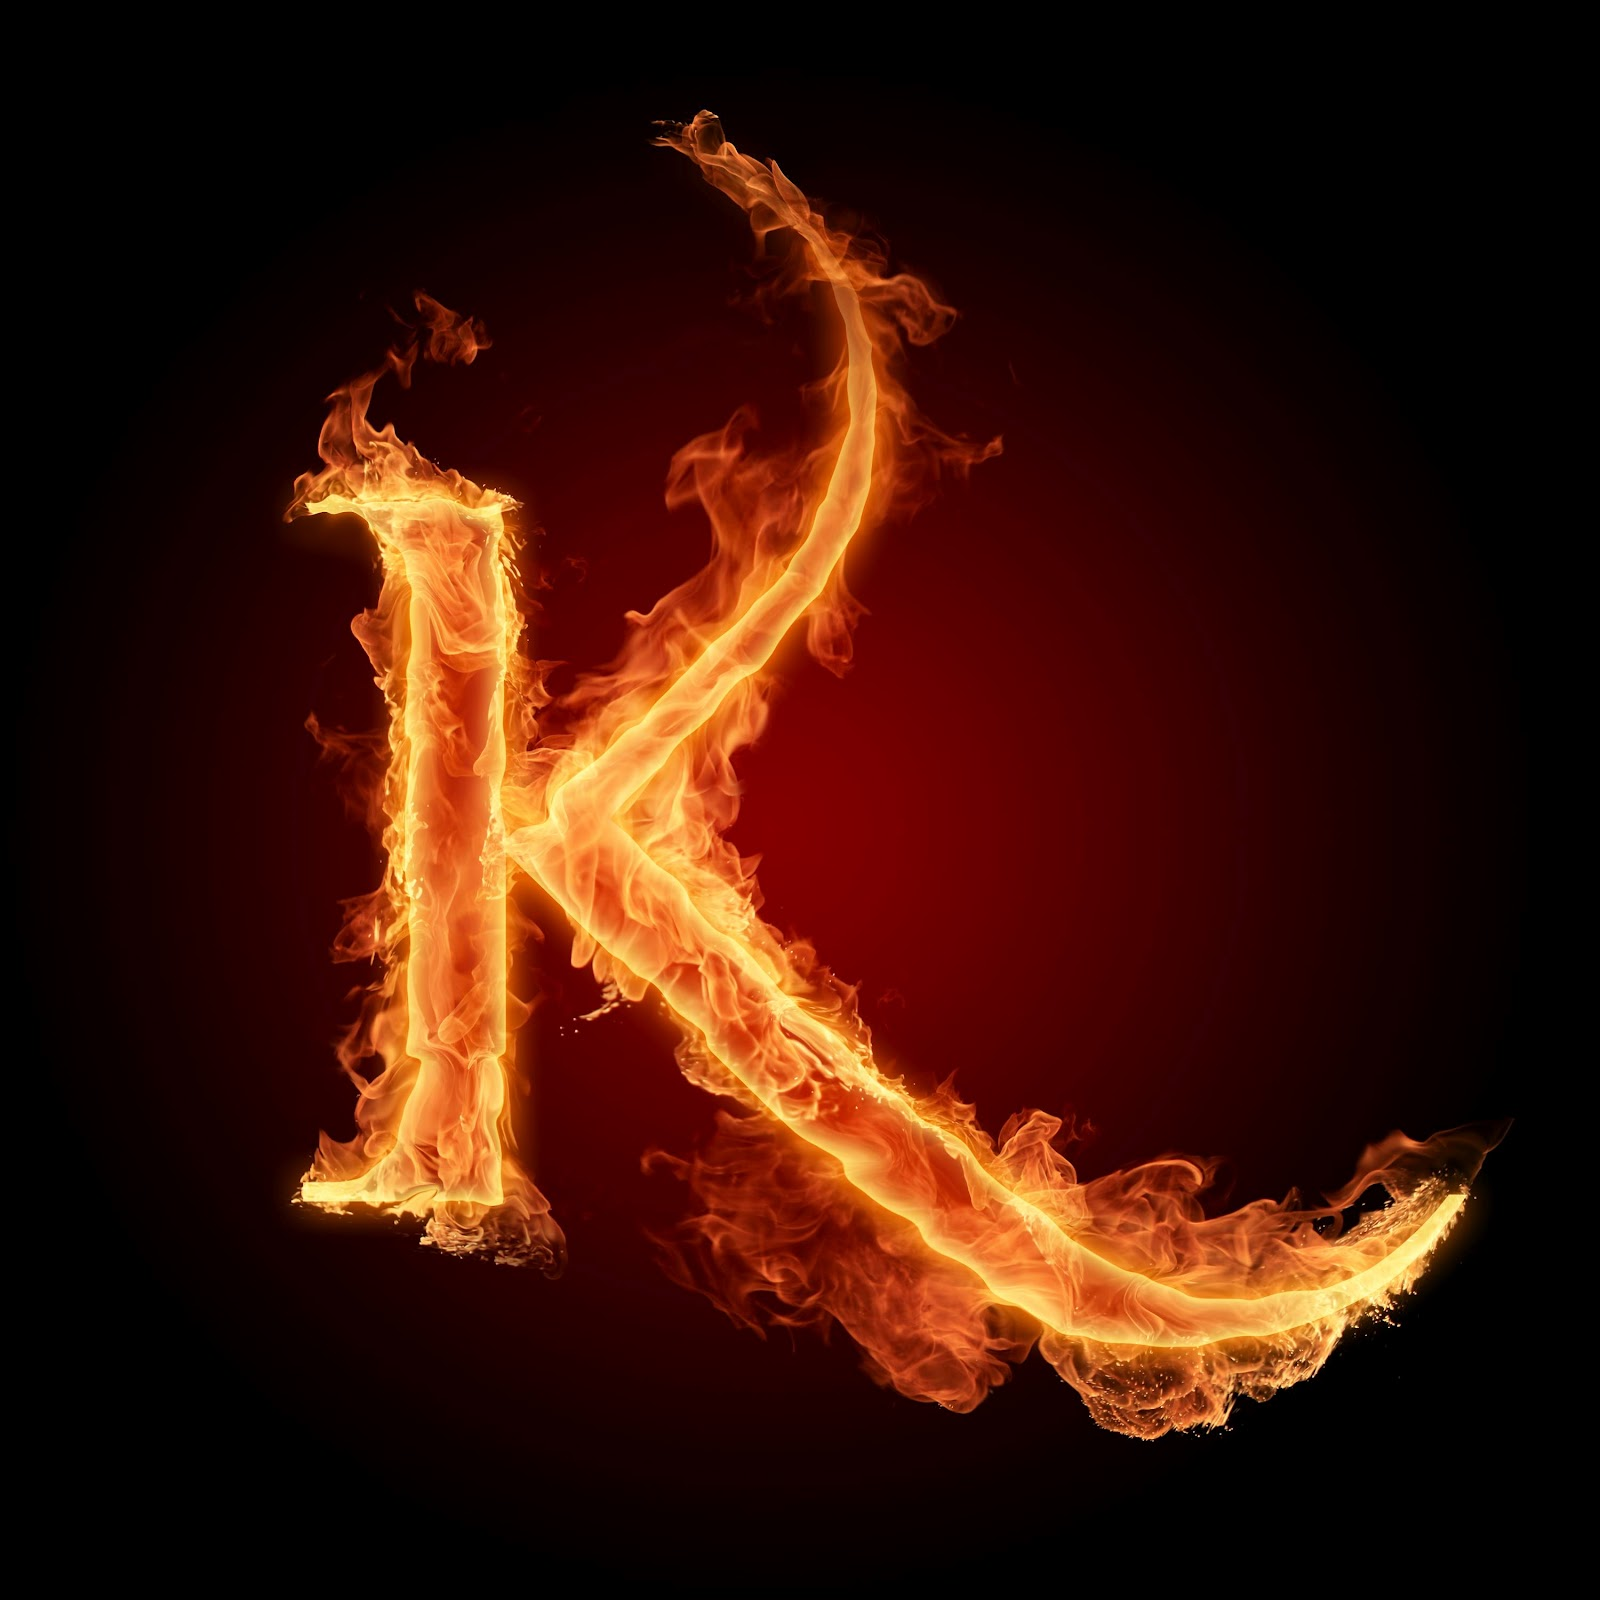 http://1.bp.blogspot.com/-MUB_i5q5wbA/UB0yiwmv9MI/AAAAAAAAAKE/549Uz_K3_-g/s1600/Burning+Alphabet+Wallpaper+K.jpg